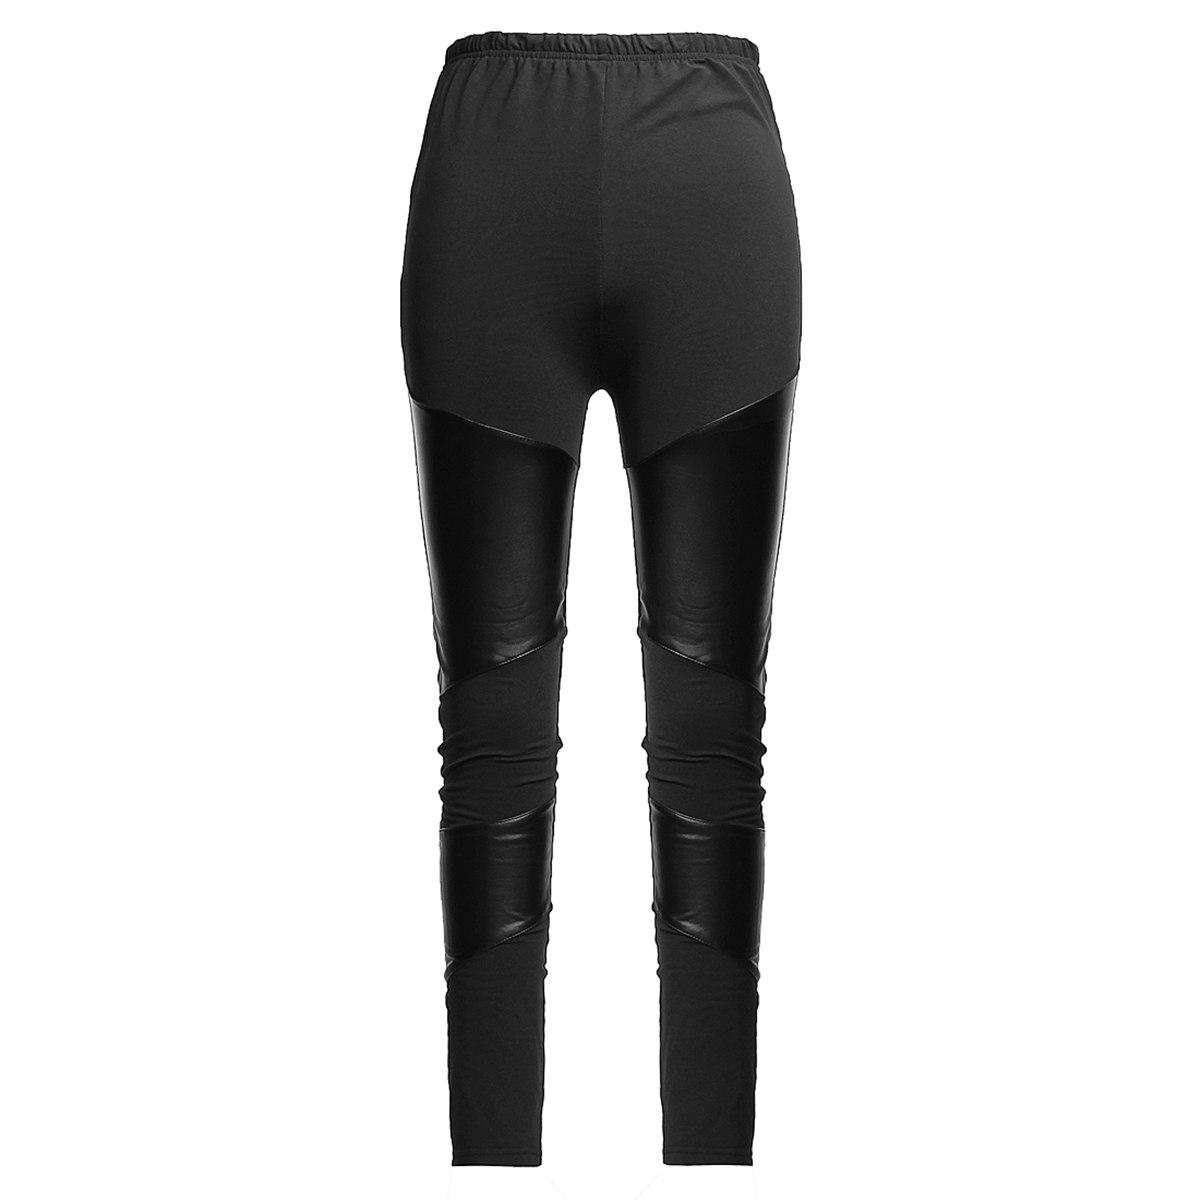 Zanzea Faux Leather Stretchy Shiny Tights Leggings